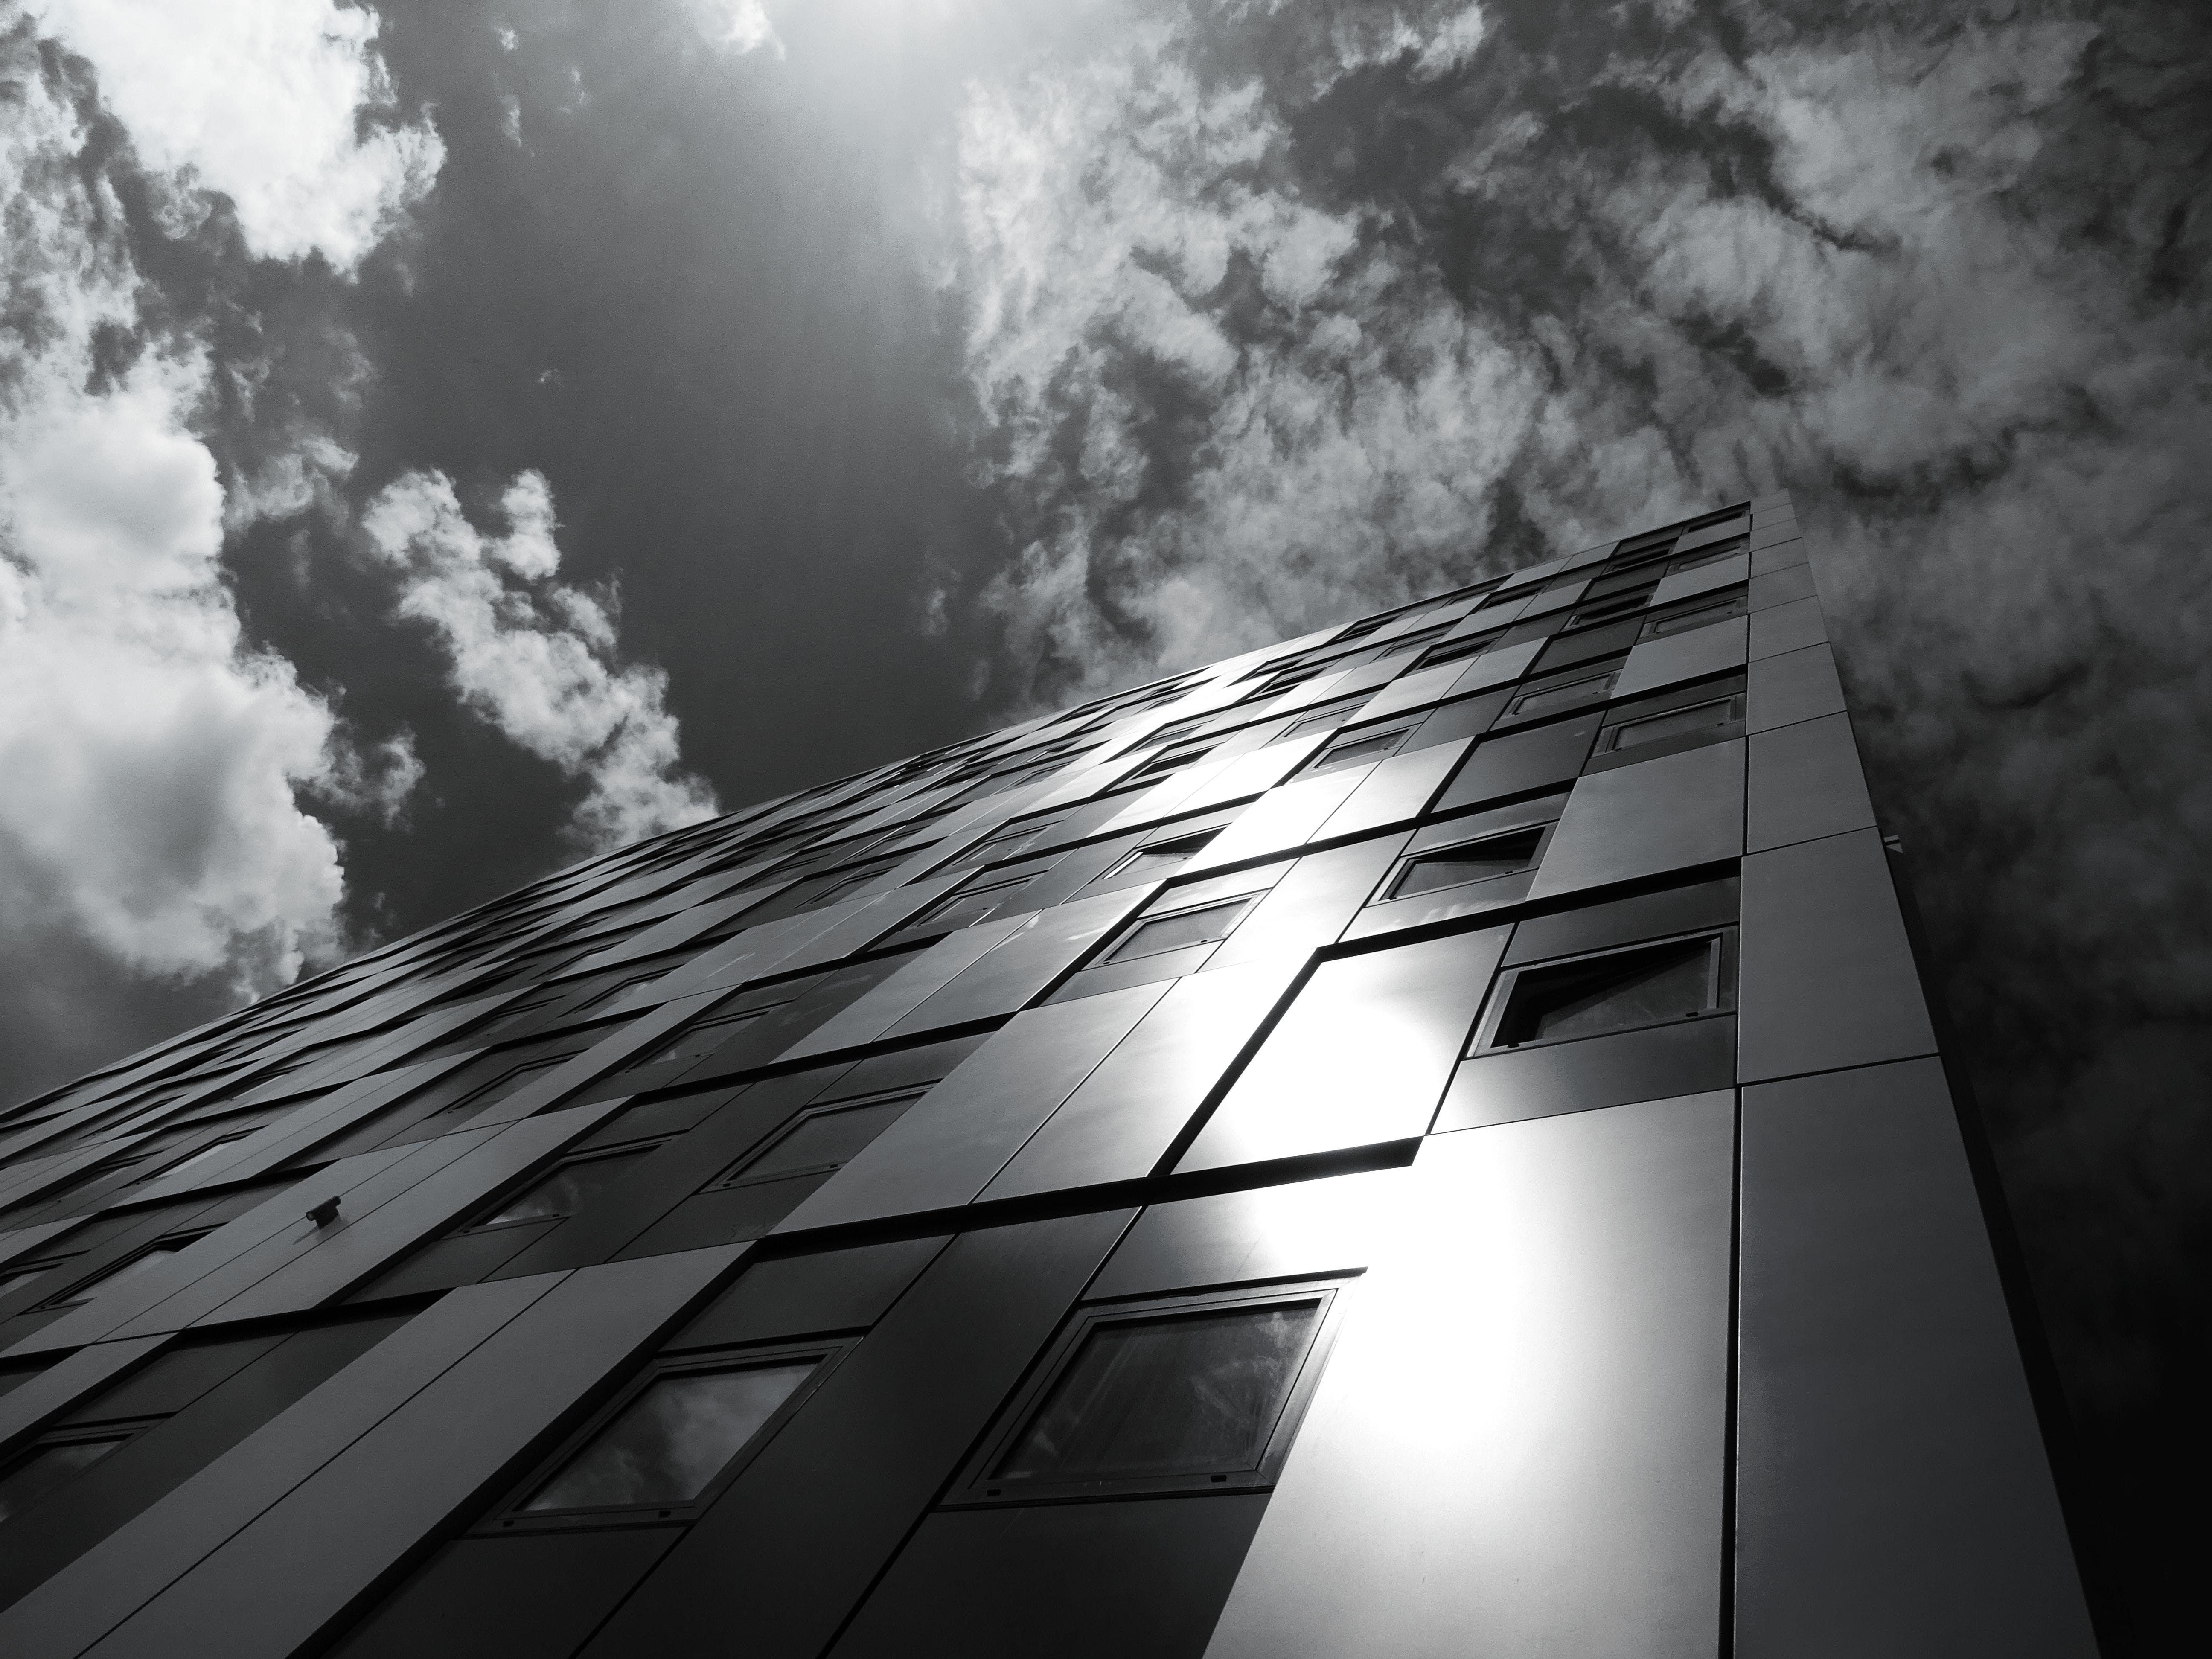 Building Under Clouds